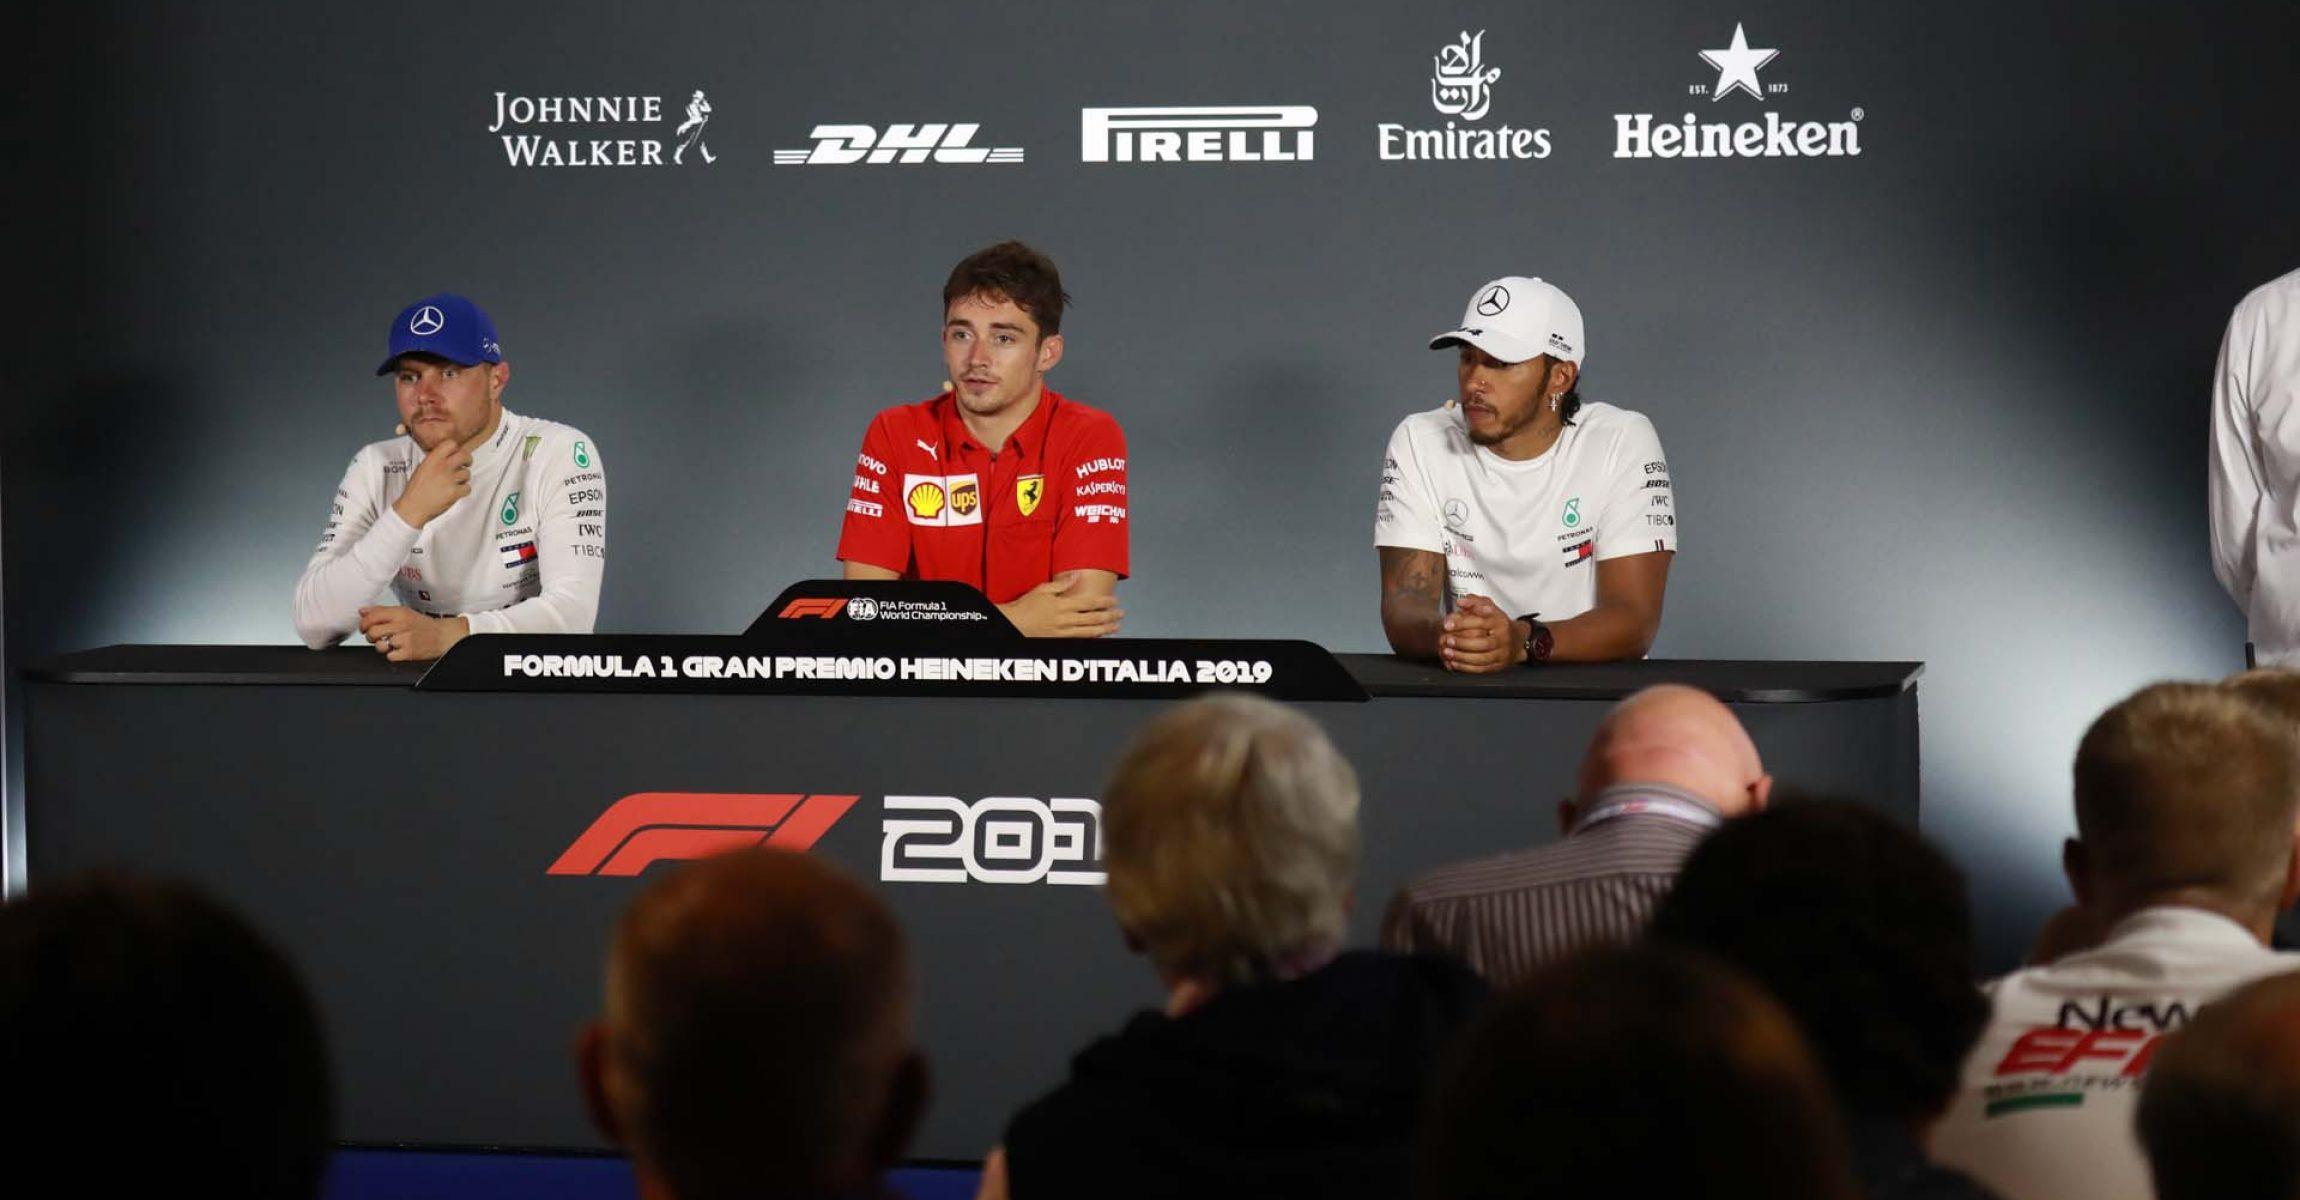 Valtteri Bottas (Mercedes), Charles Leclerc (Ferrari) & Lewis Hamilton (Mercedes) during the press conference after the Italian Grand Prix in Monza (2019)